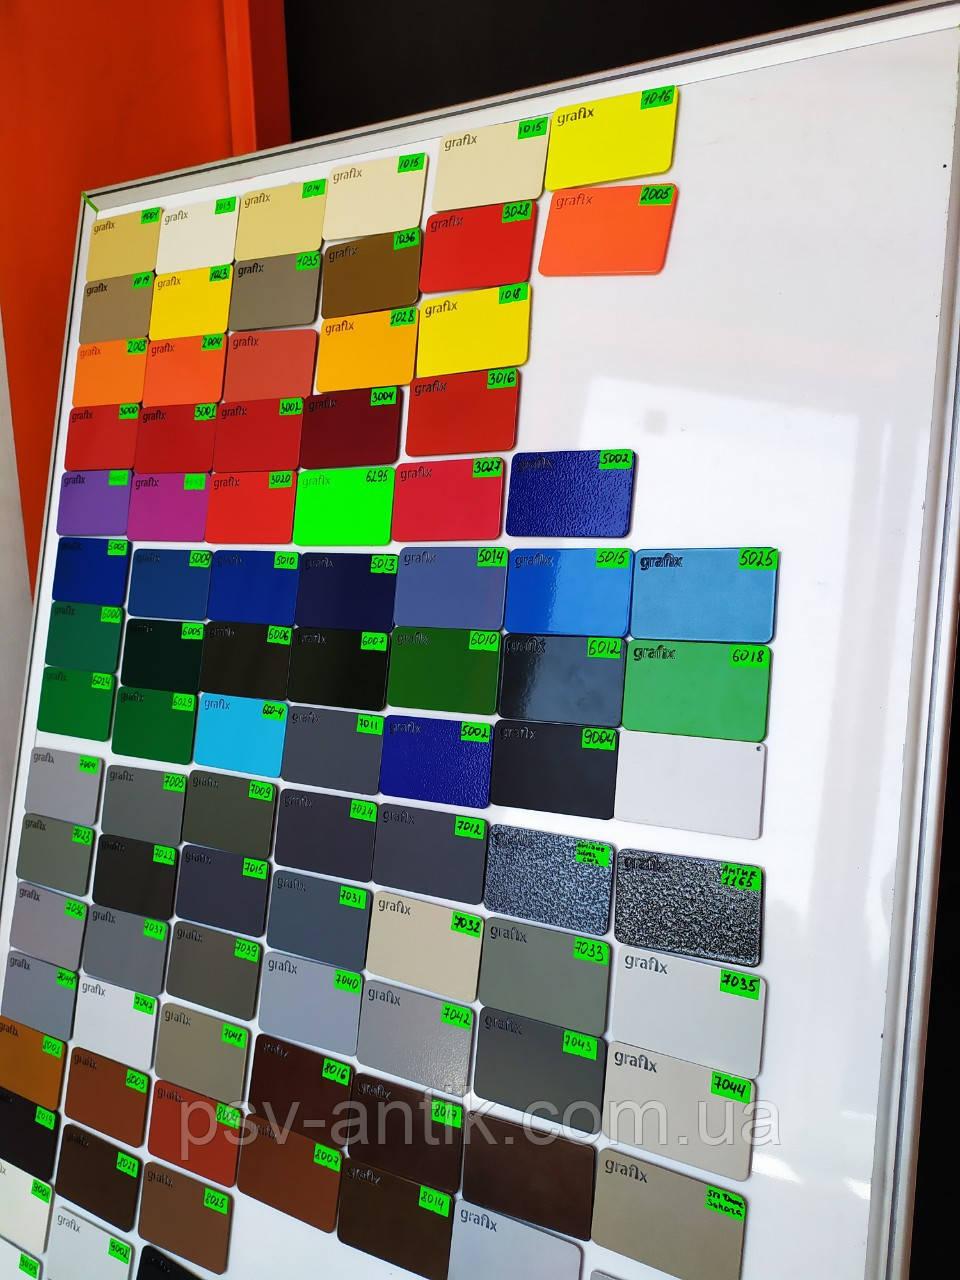 Порошковая краска глянцевая, полиэфирная, архитектурная, 5024